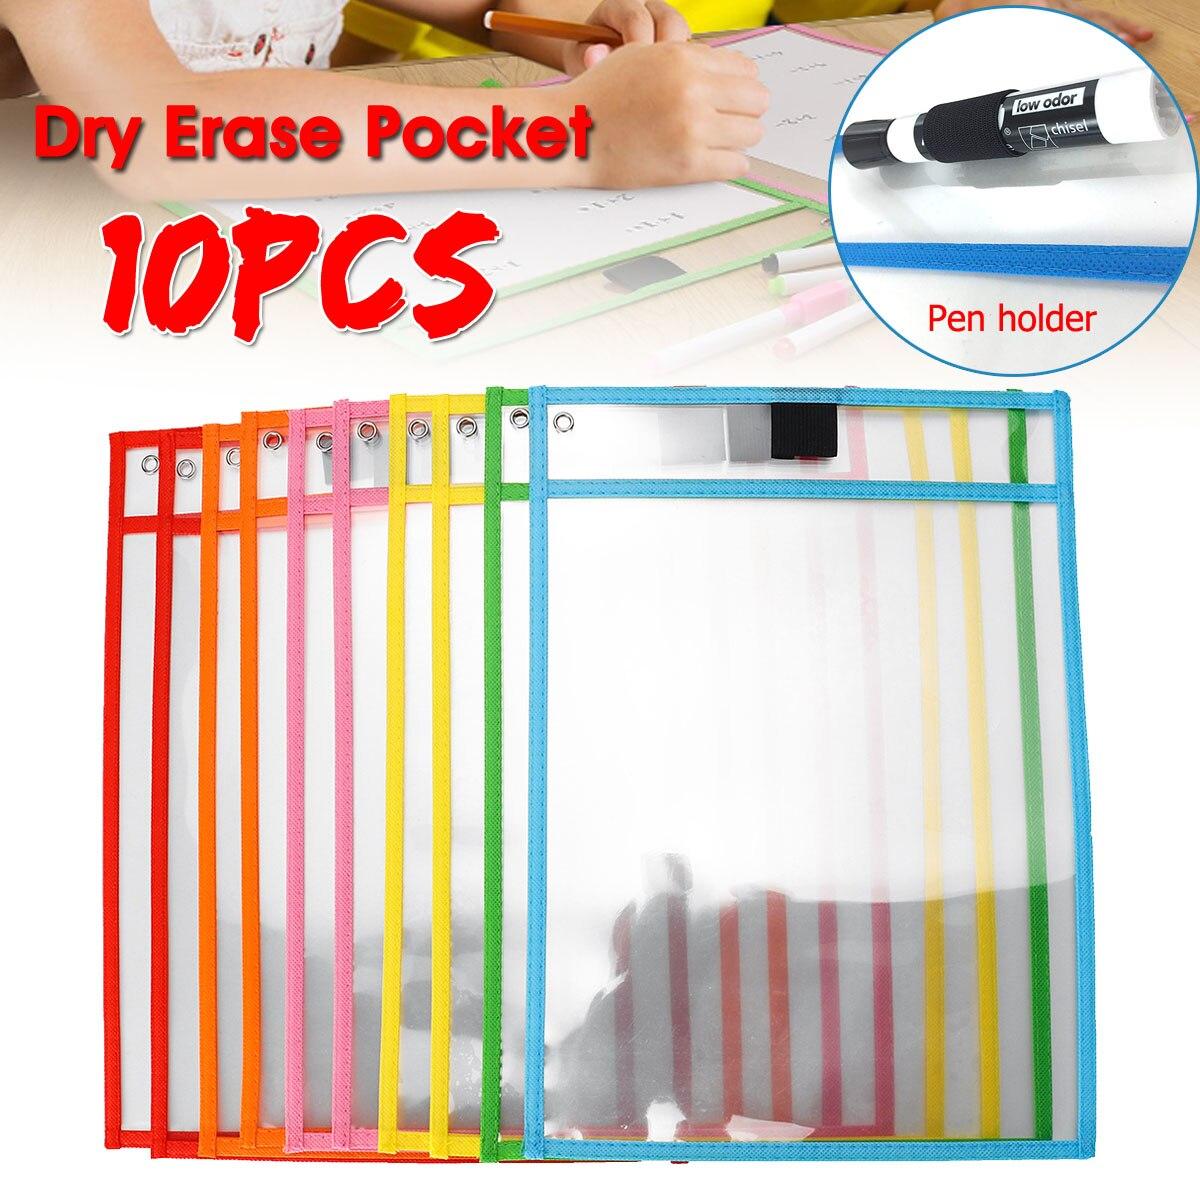 10Pcs Reusable  Pocket Write And Wipe Classroom Organization Environmental Protection Students Kids Tools School Kits